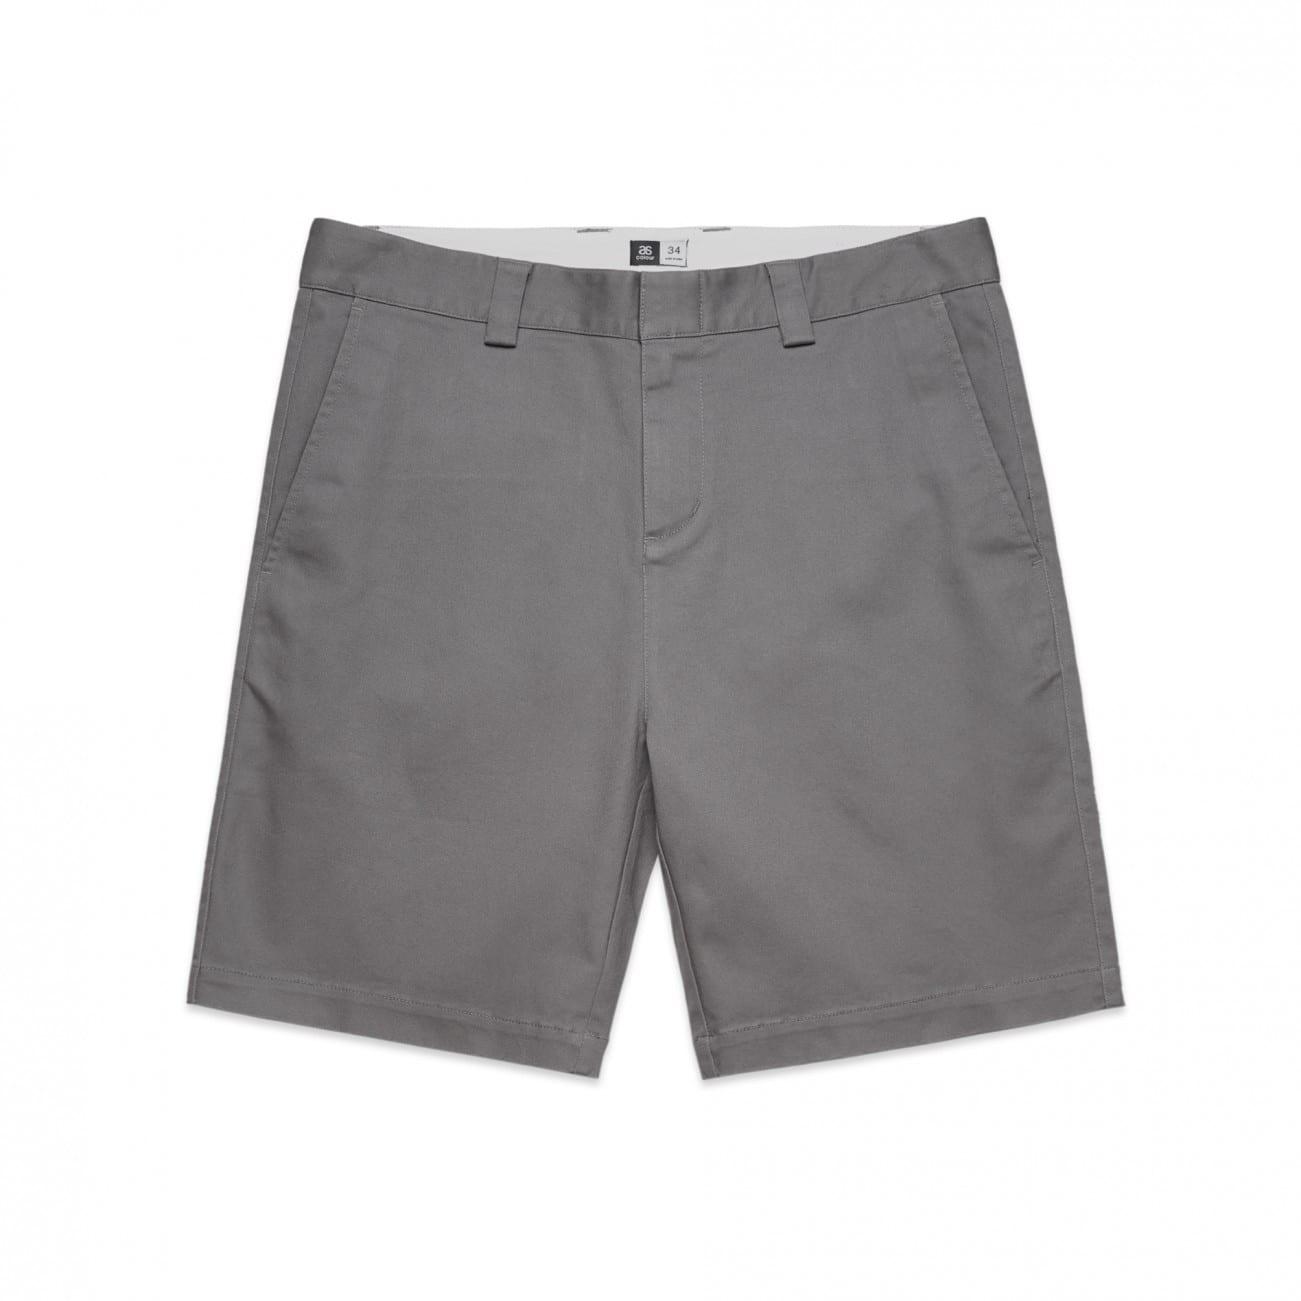 AS 5906 Uniform Short